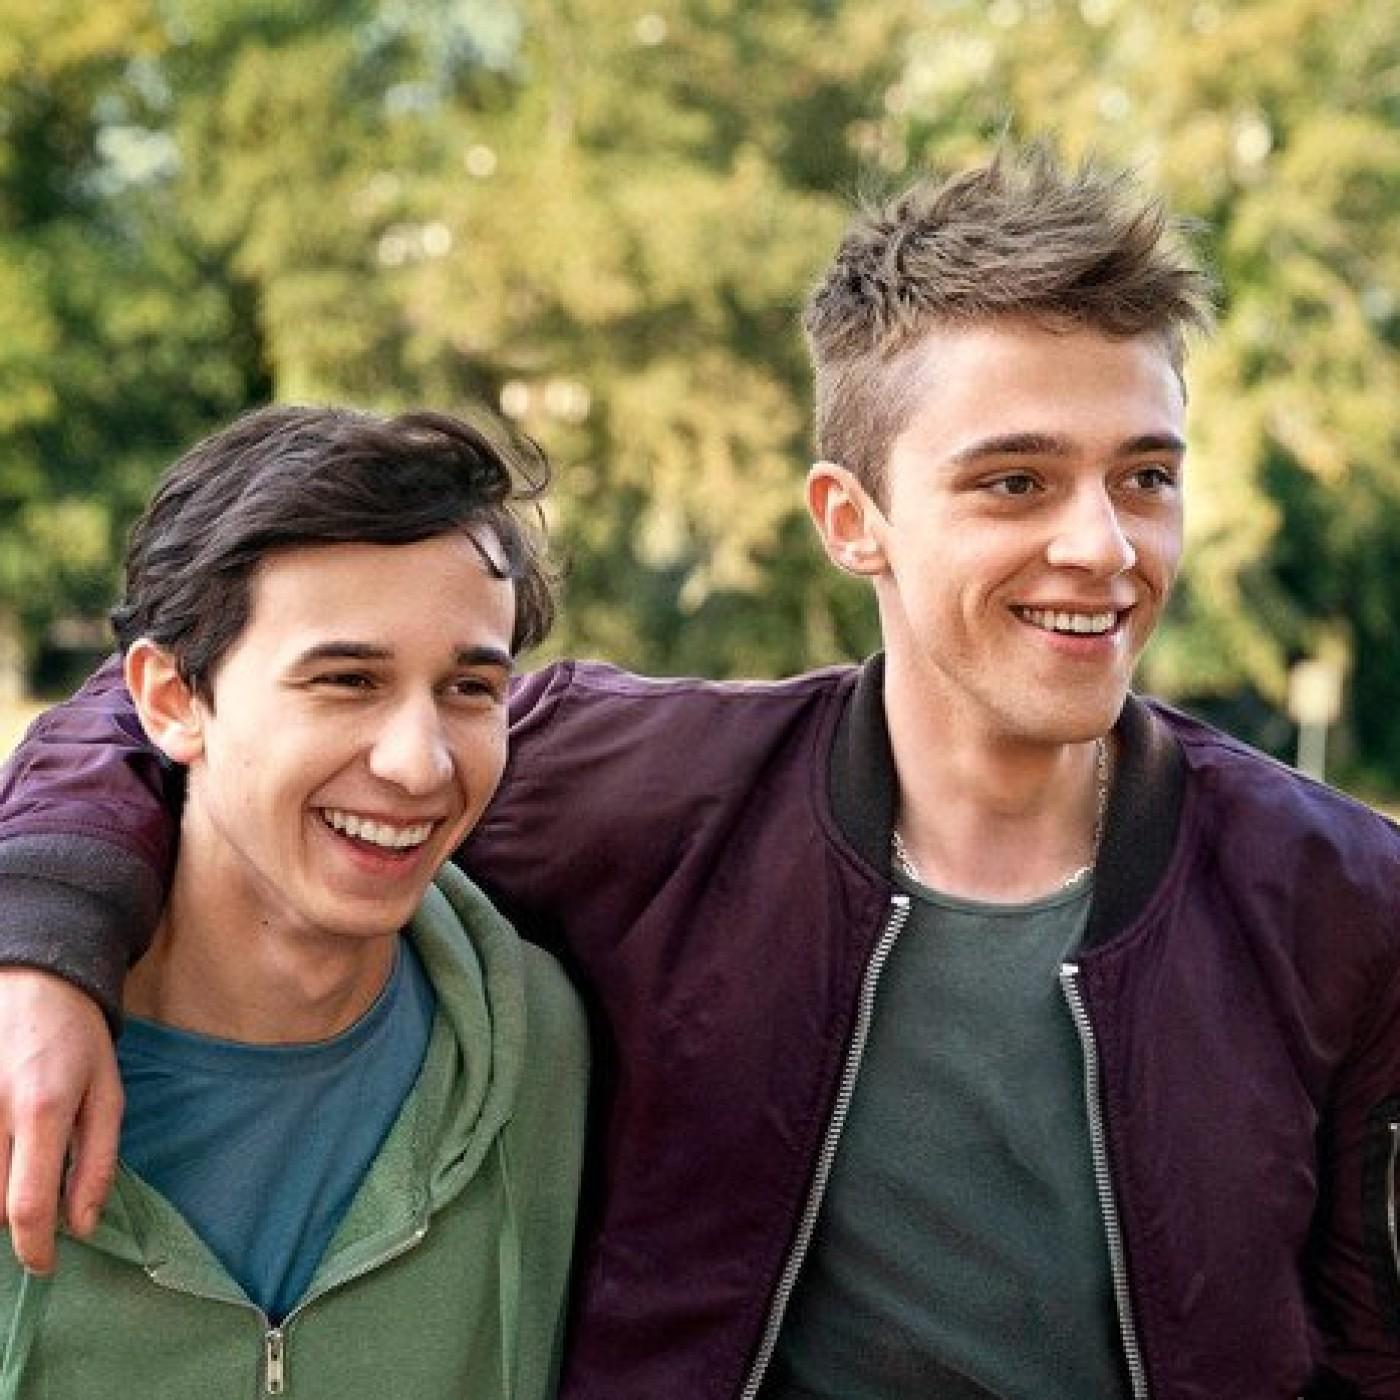 Un Vrai Bonhomme : Un teen movie original